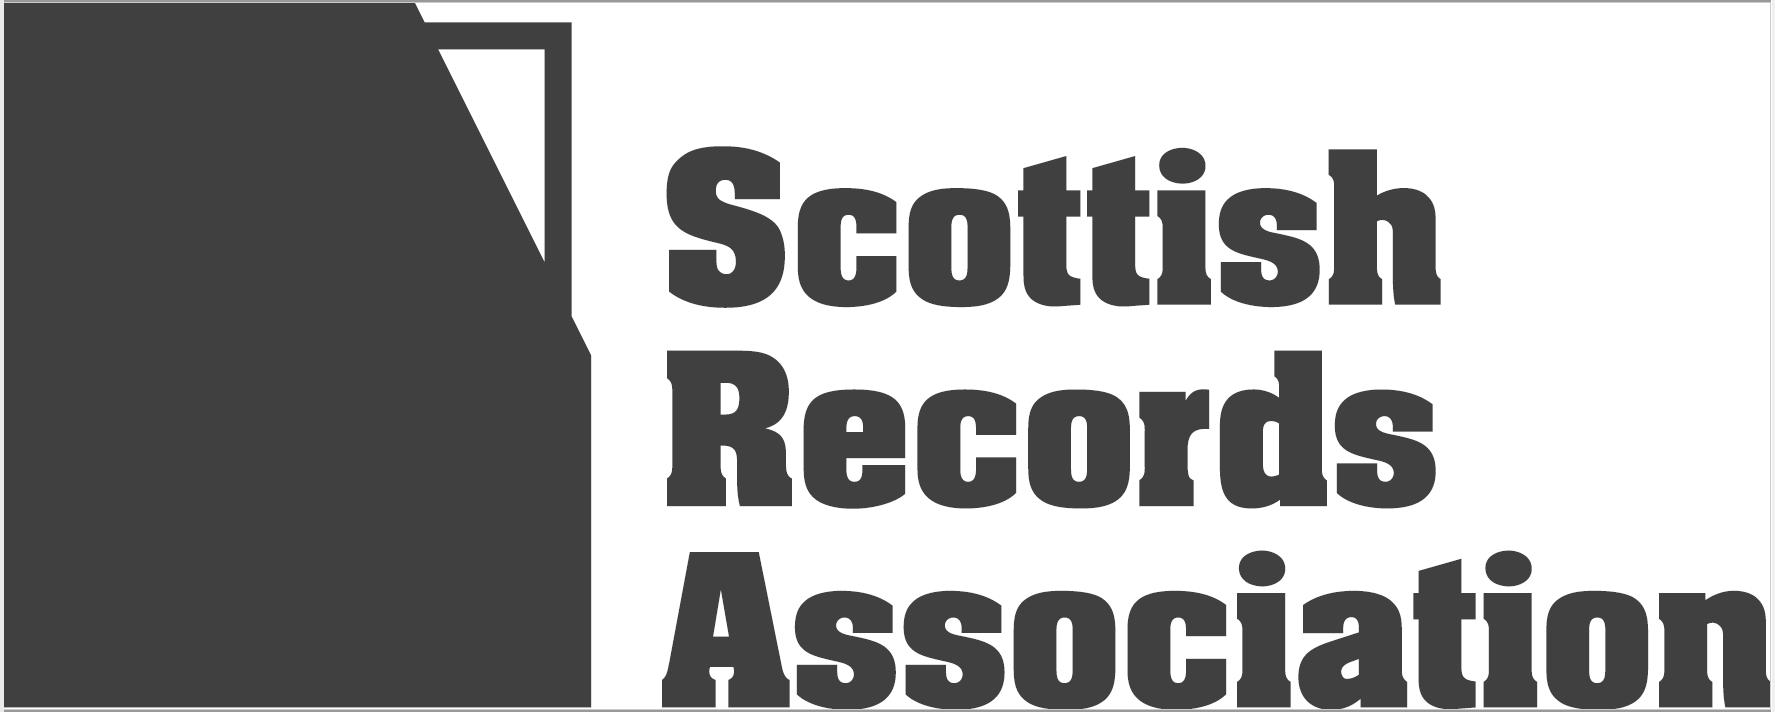 Scottish Records Association logo